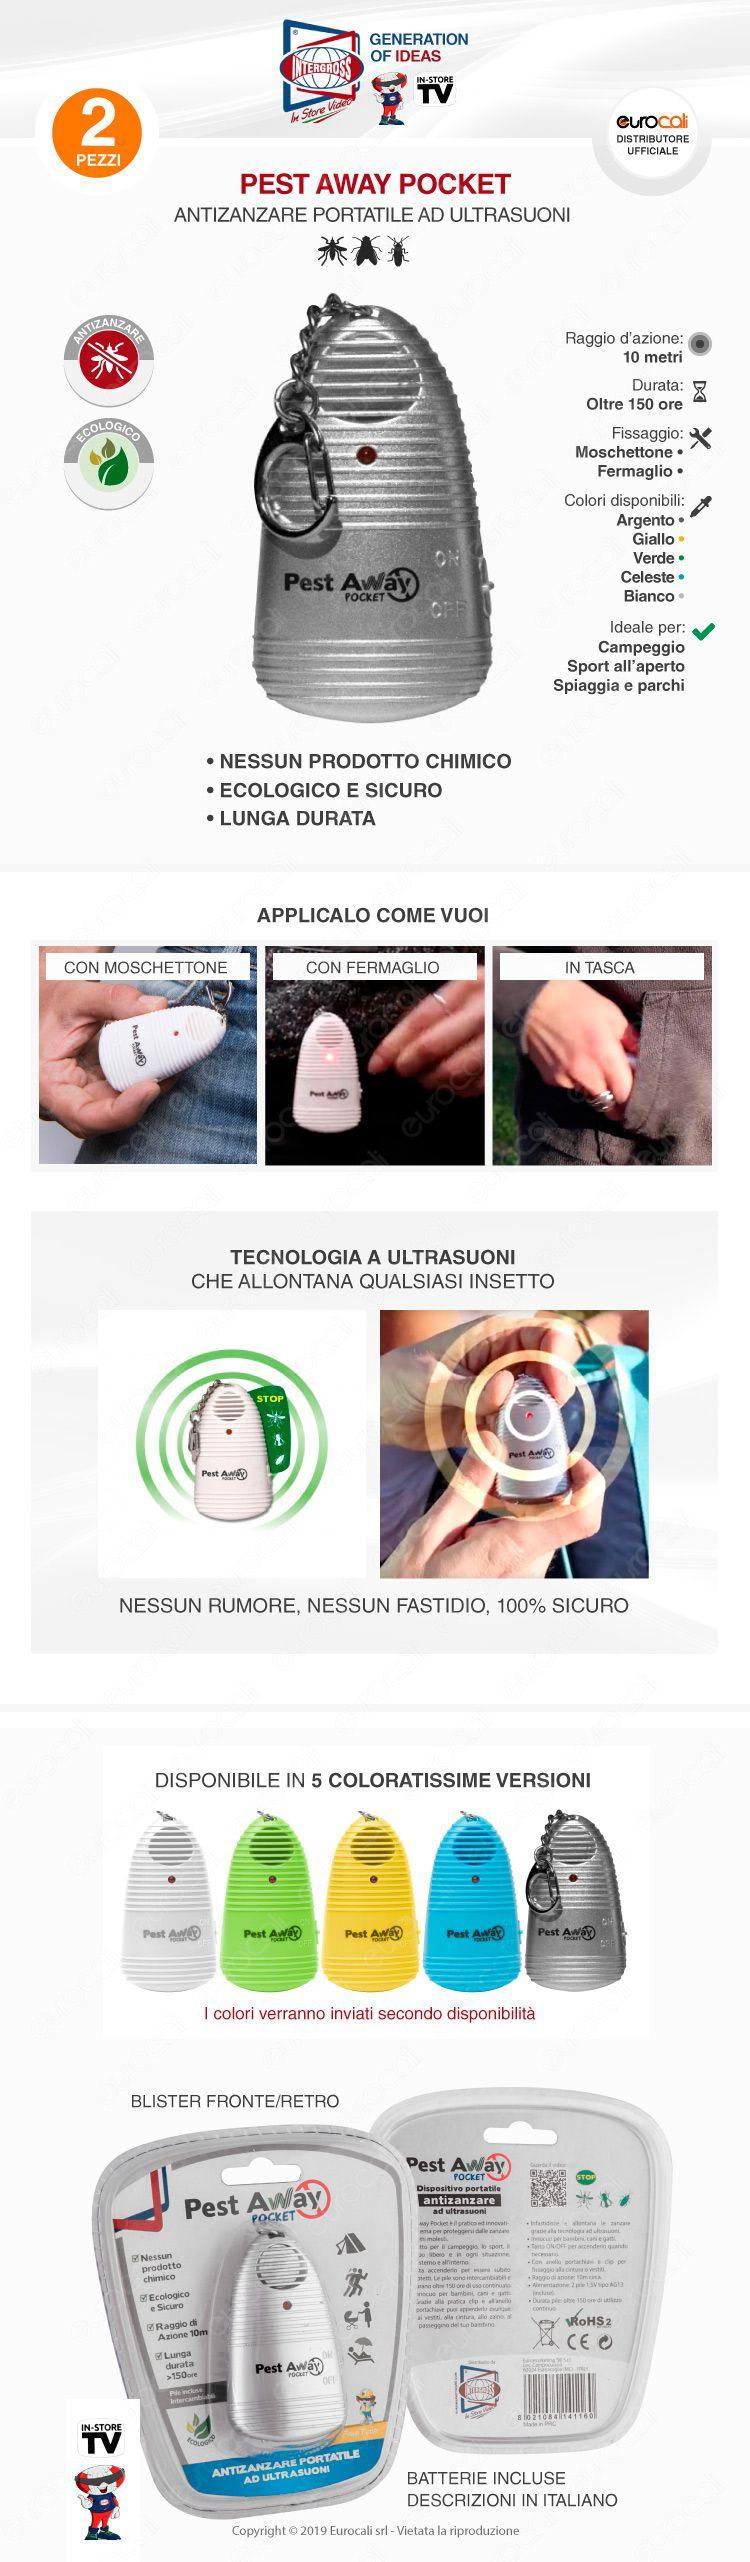 kit 2 intergross pest away pocket antizanzare portatile ad ultrasuoni